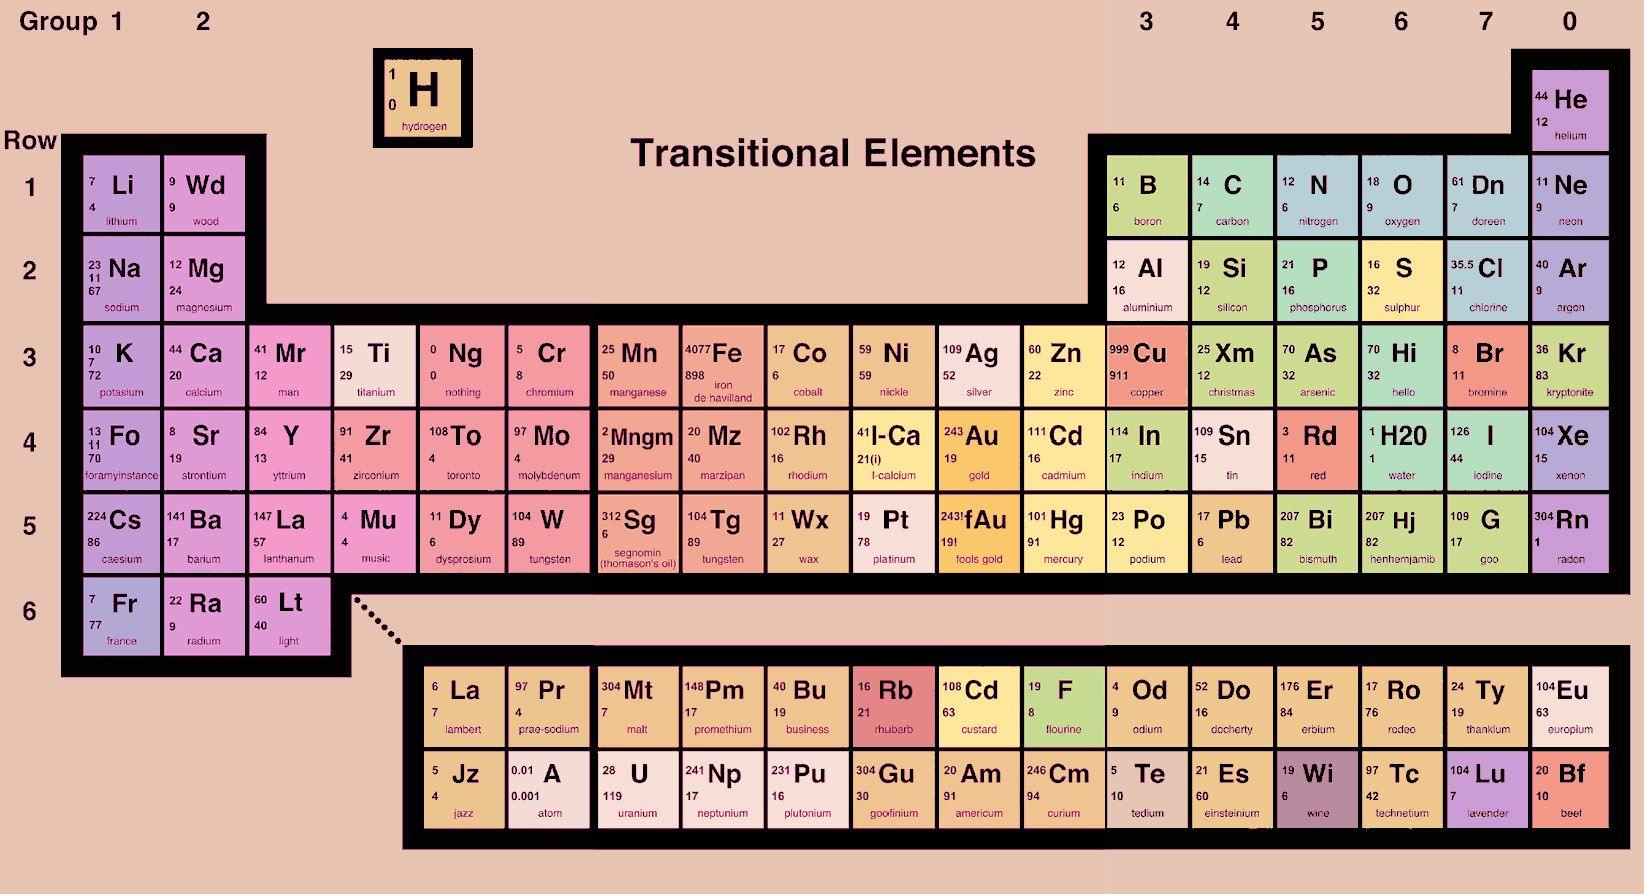 Alternative Periodic Table Warrants A Closer Look